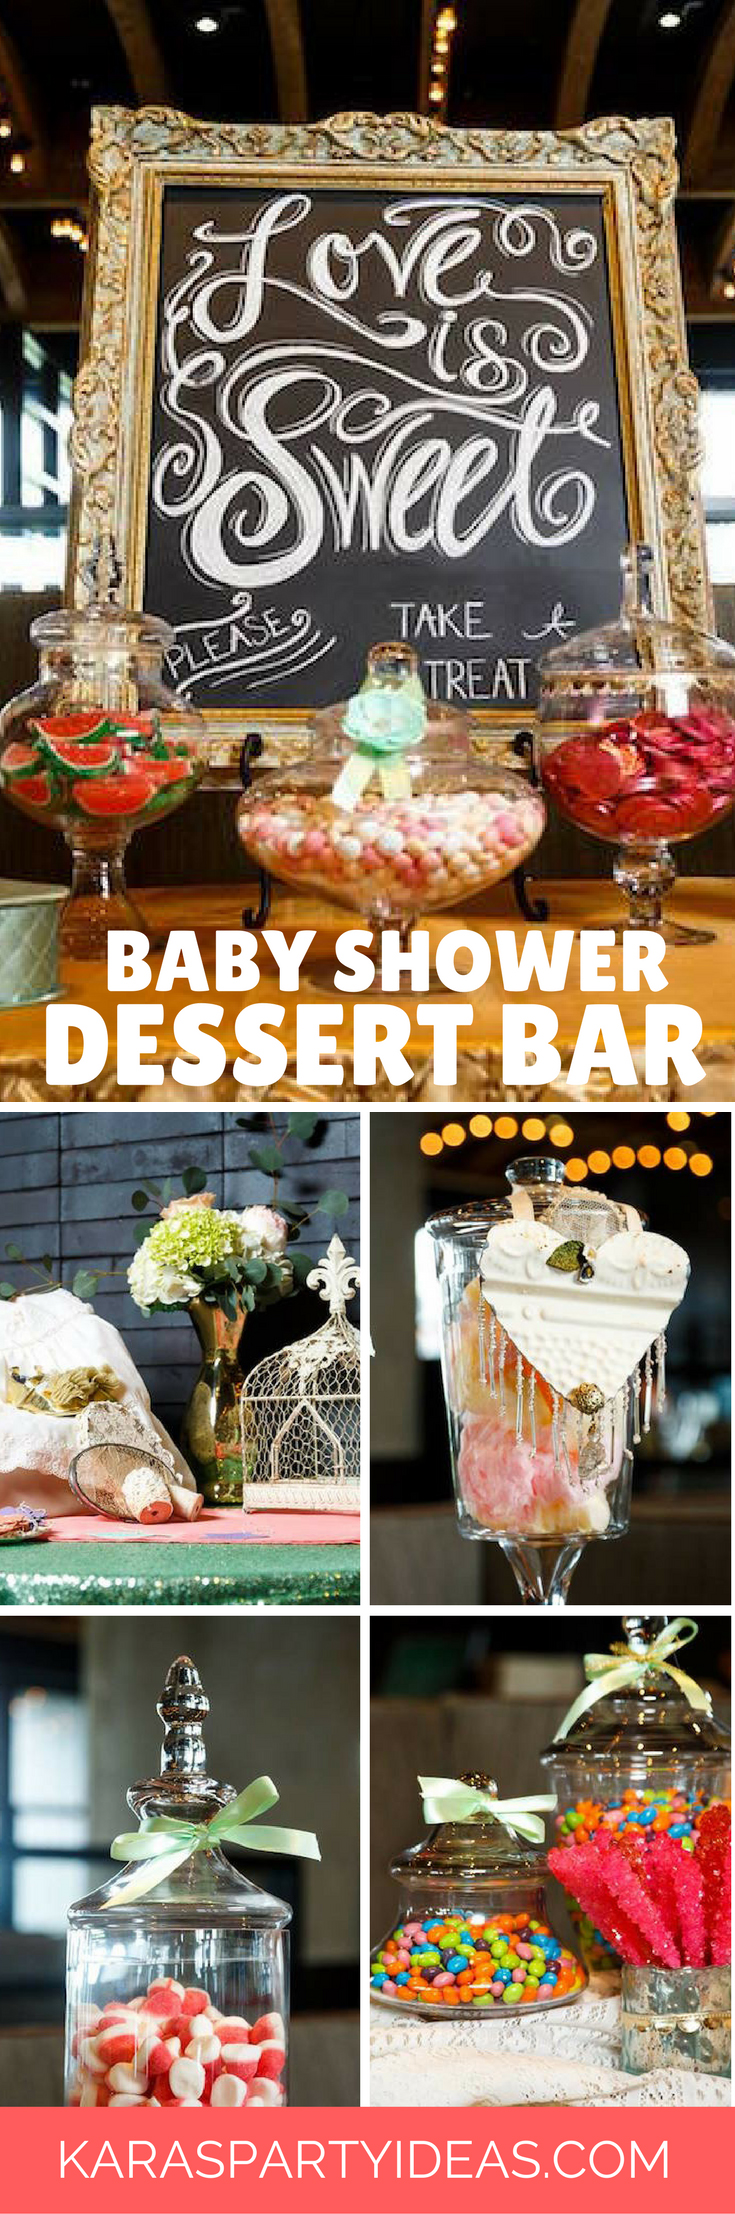 Love Is Sweet Baby Shower Dessert Bar Via Karau0027s Party Ideas    KarasPartyIdeas.com